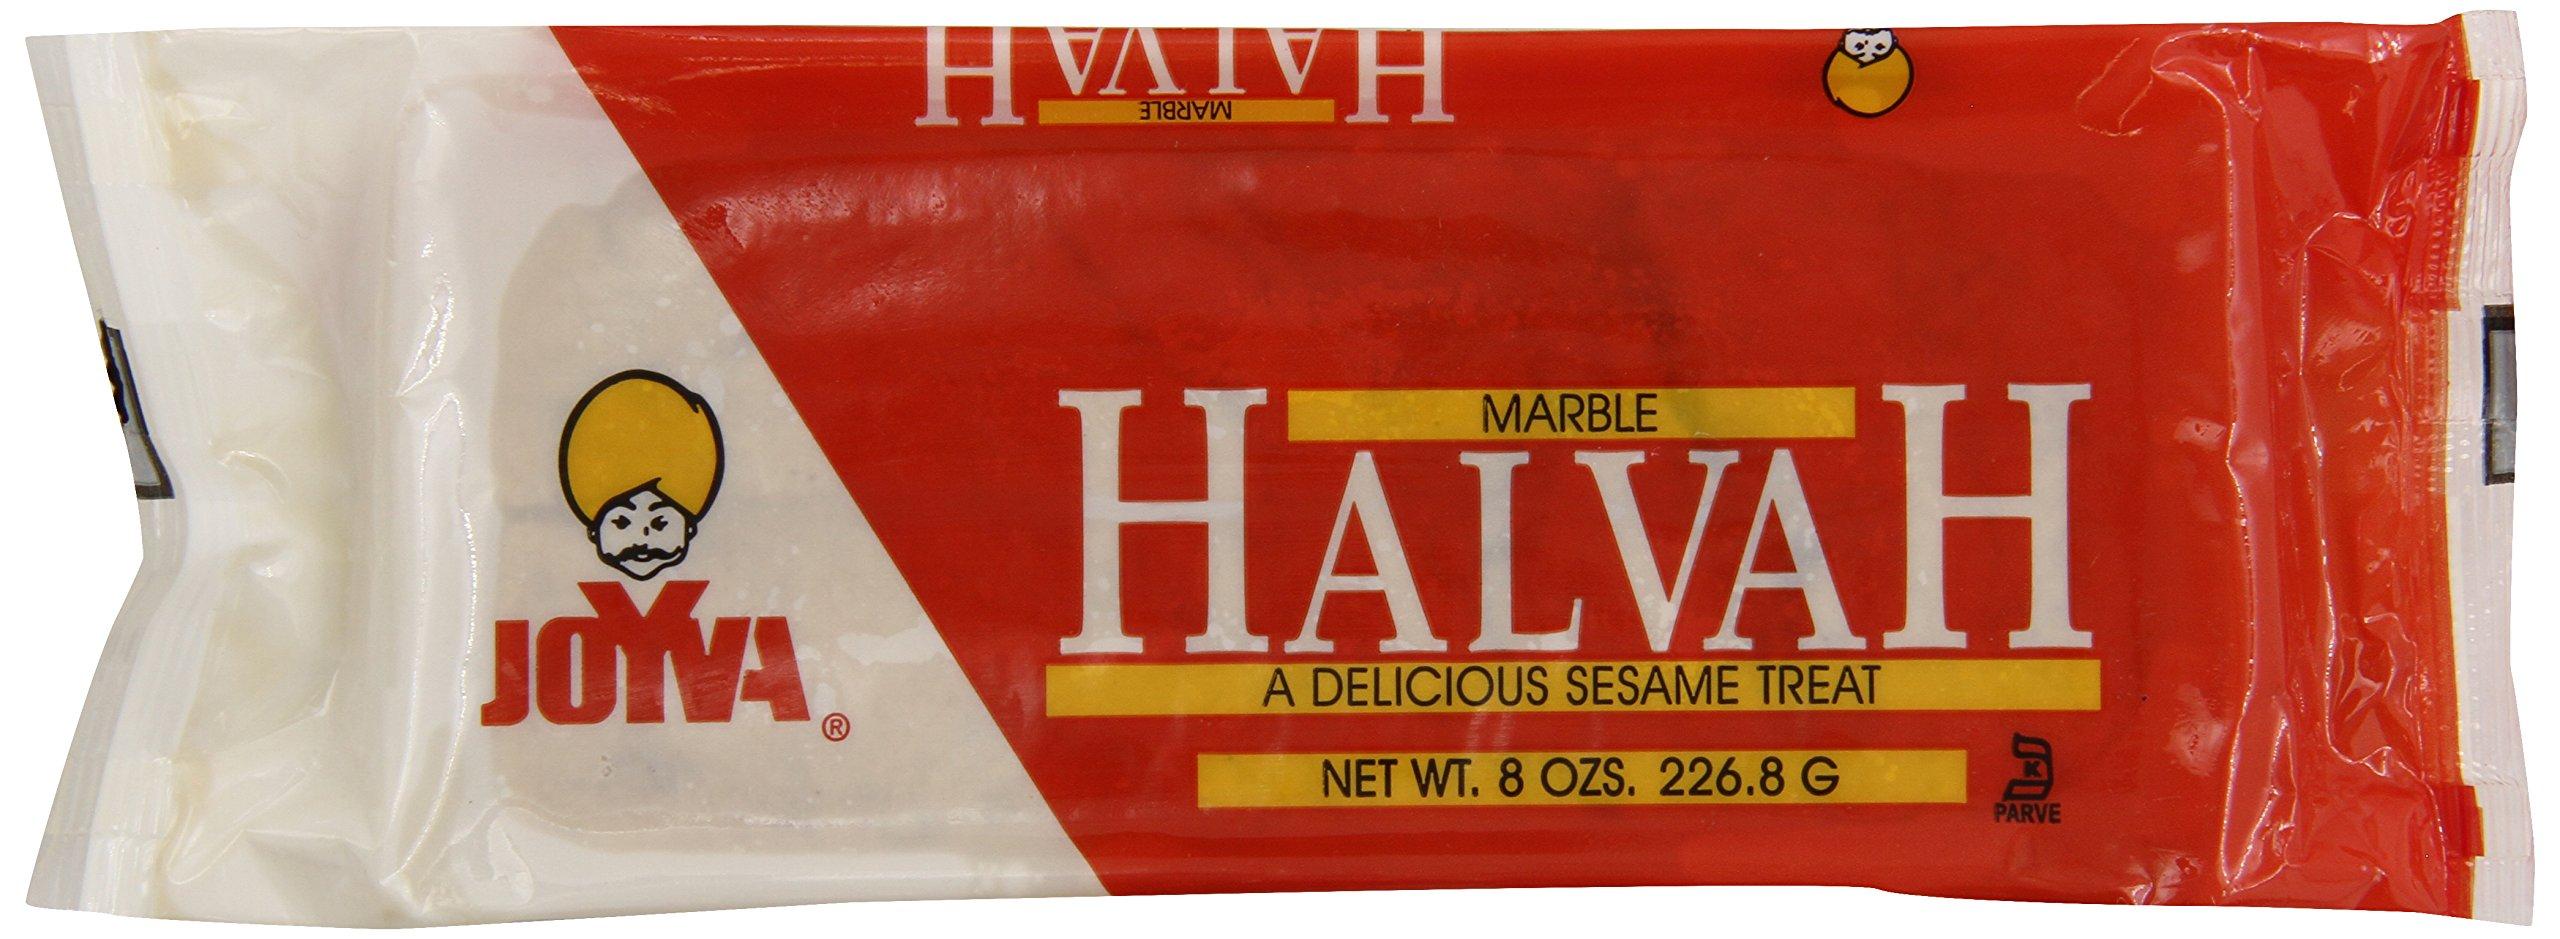 Joyva Halvah Marble Bag, 8-Ounce (Pack of 6) by Joyva